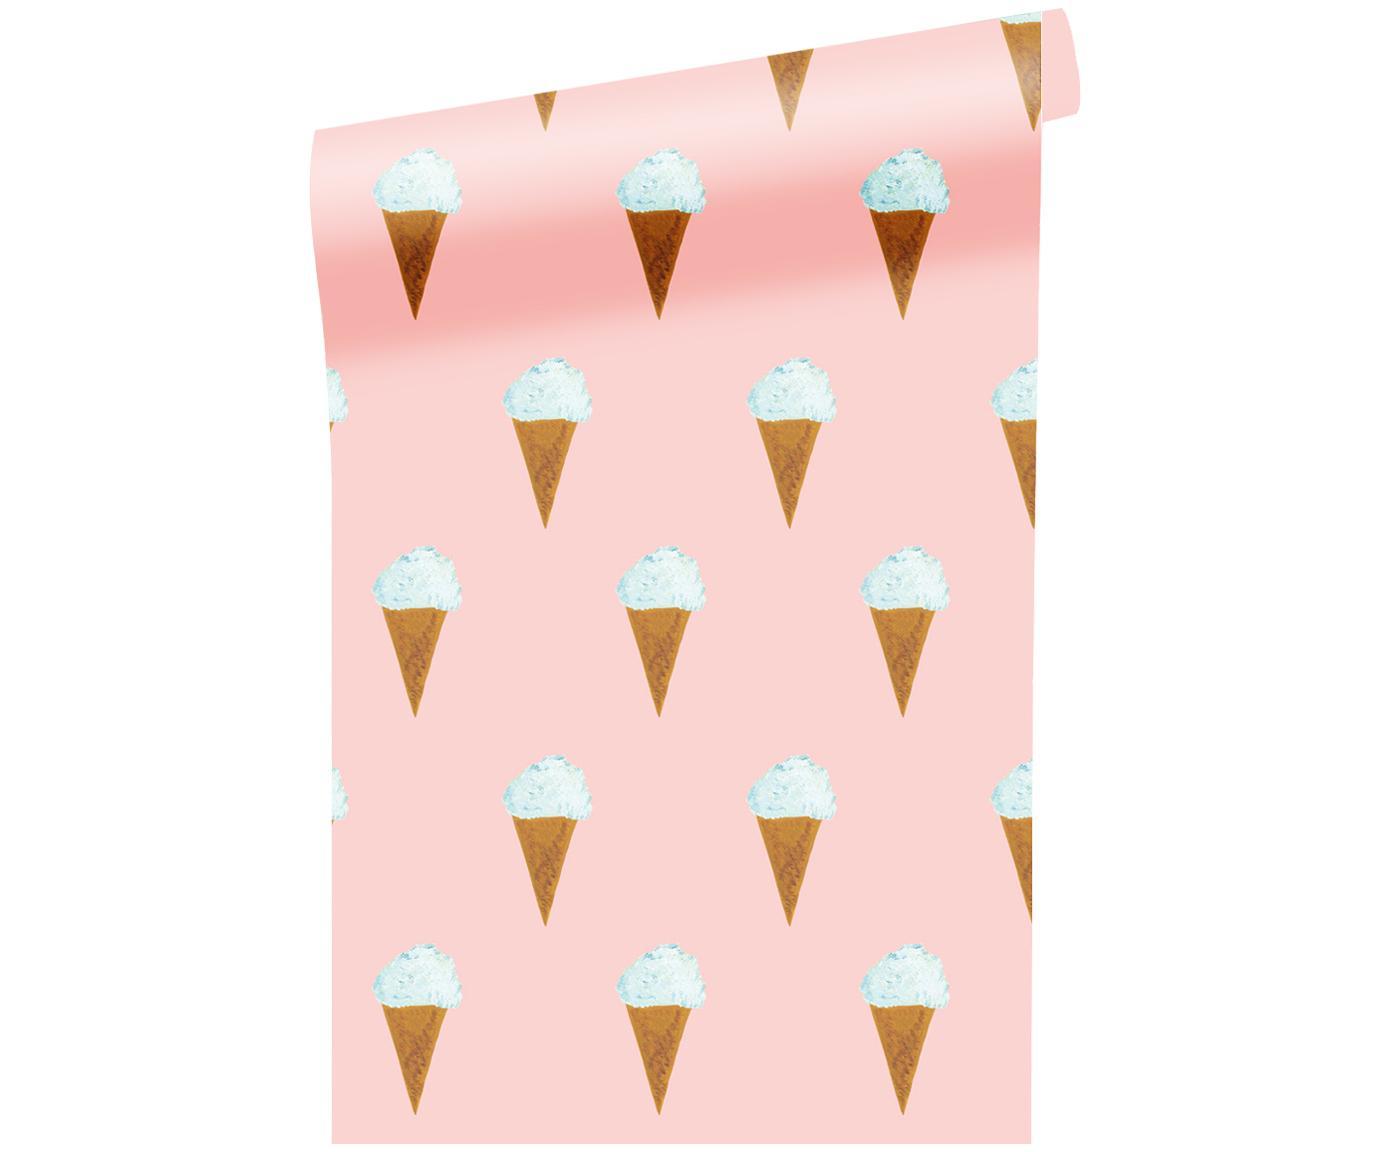 Tapete Ice Cream, Papier, matt, 165 g/m², Rosa, Weiß, Braun, B 97 x H 280